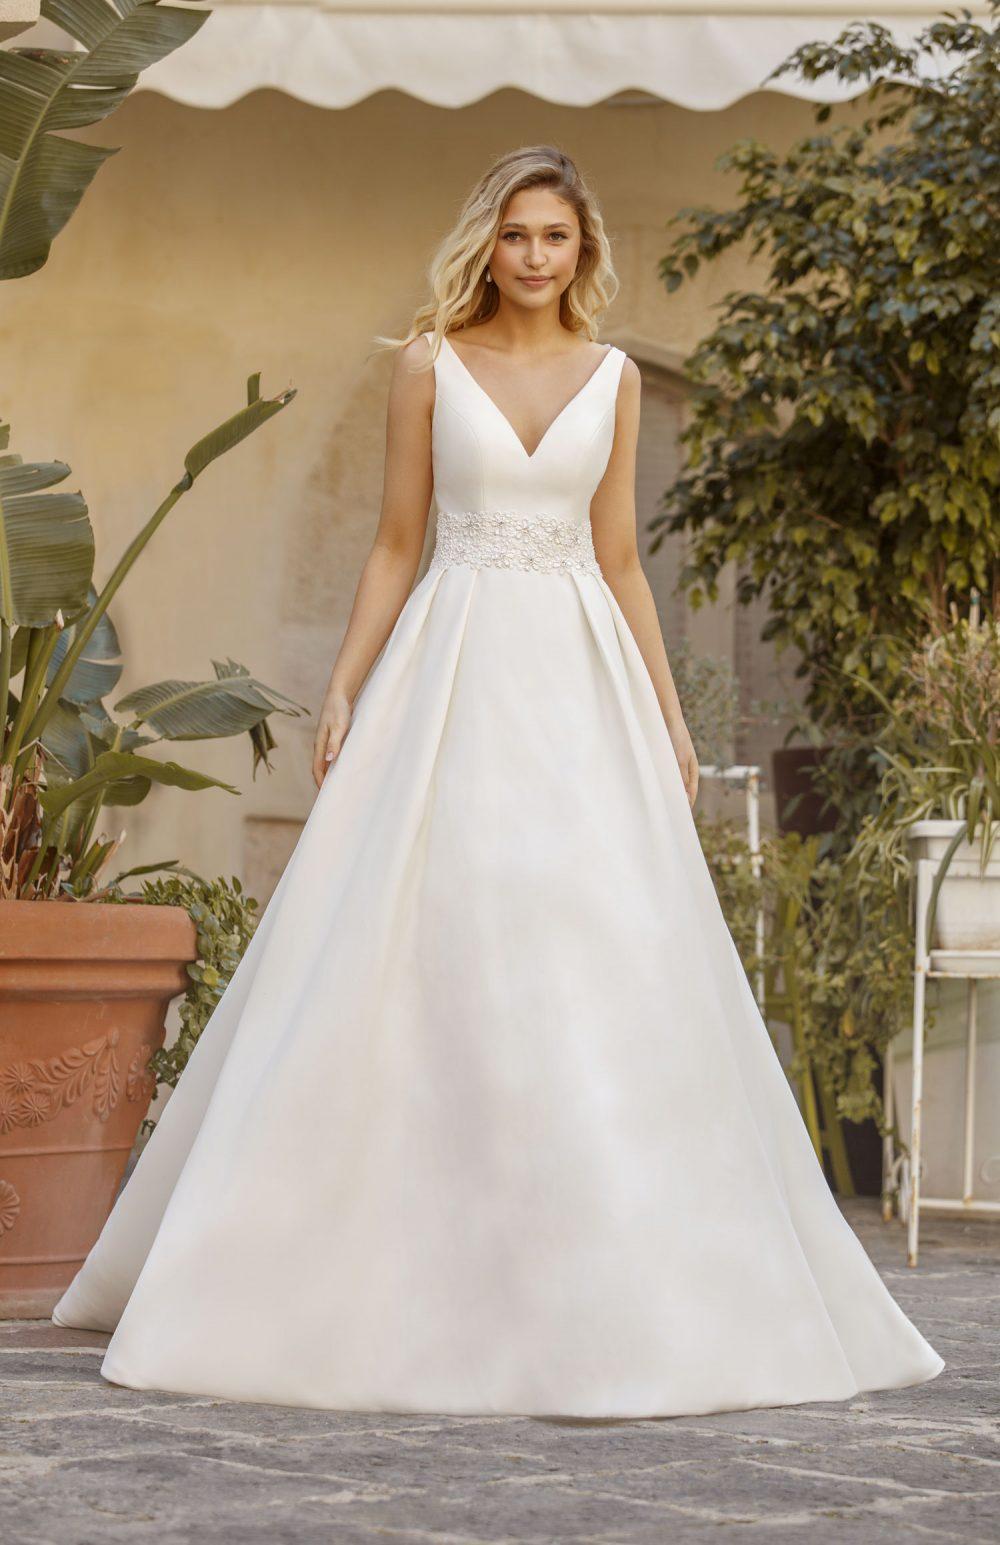 Mariages: abito da sposa Jasmine 2021 a Vicenza, Verona, Padova, Veneto Amari